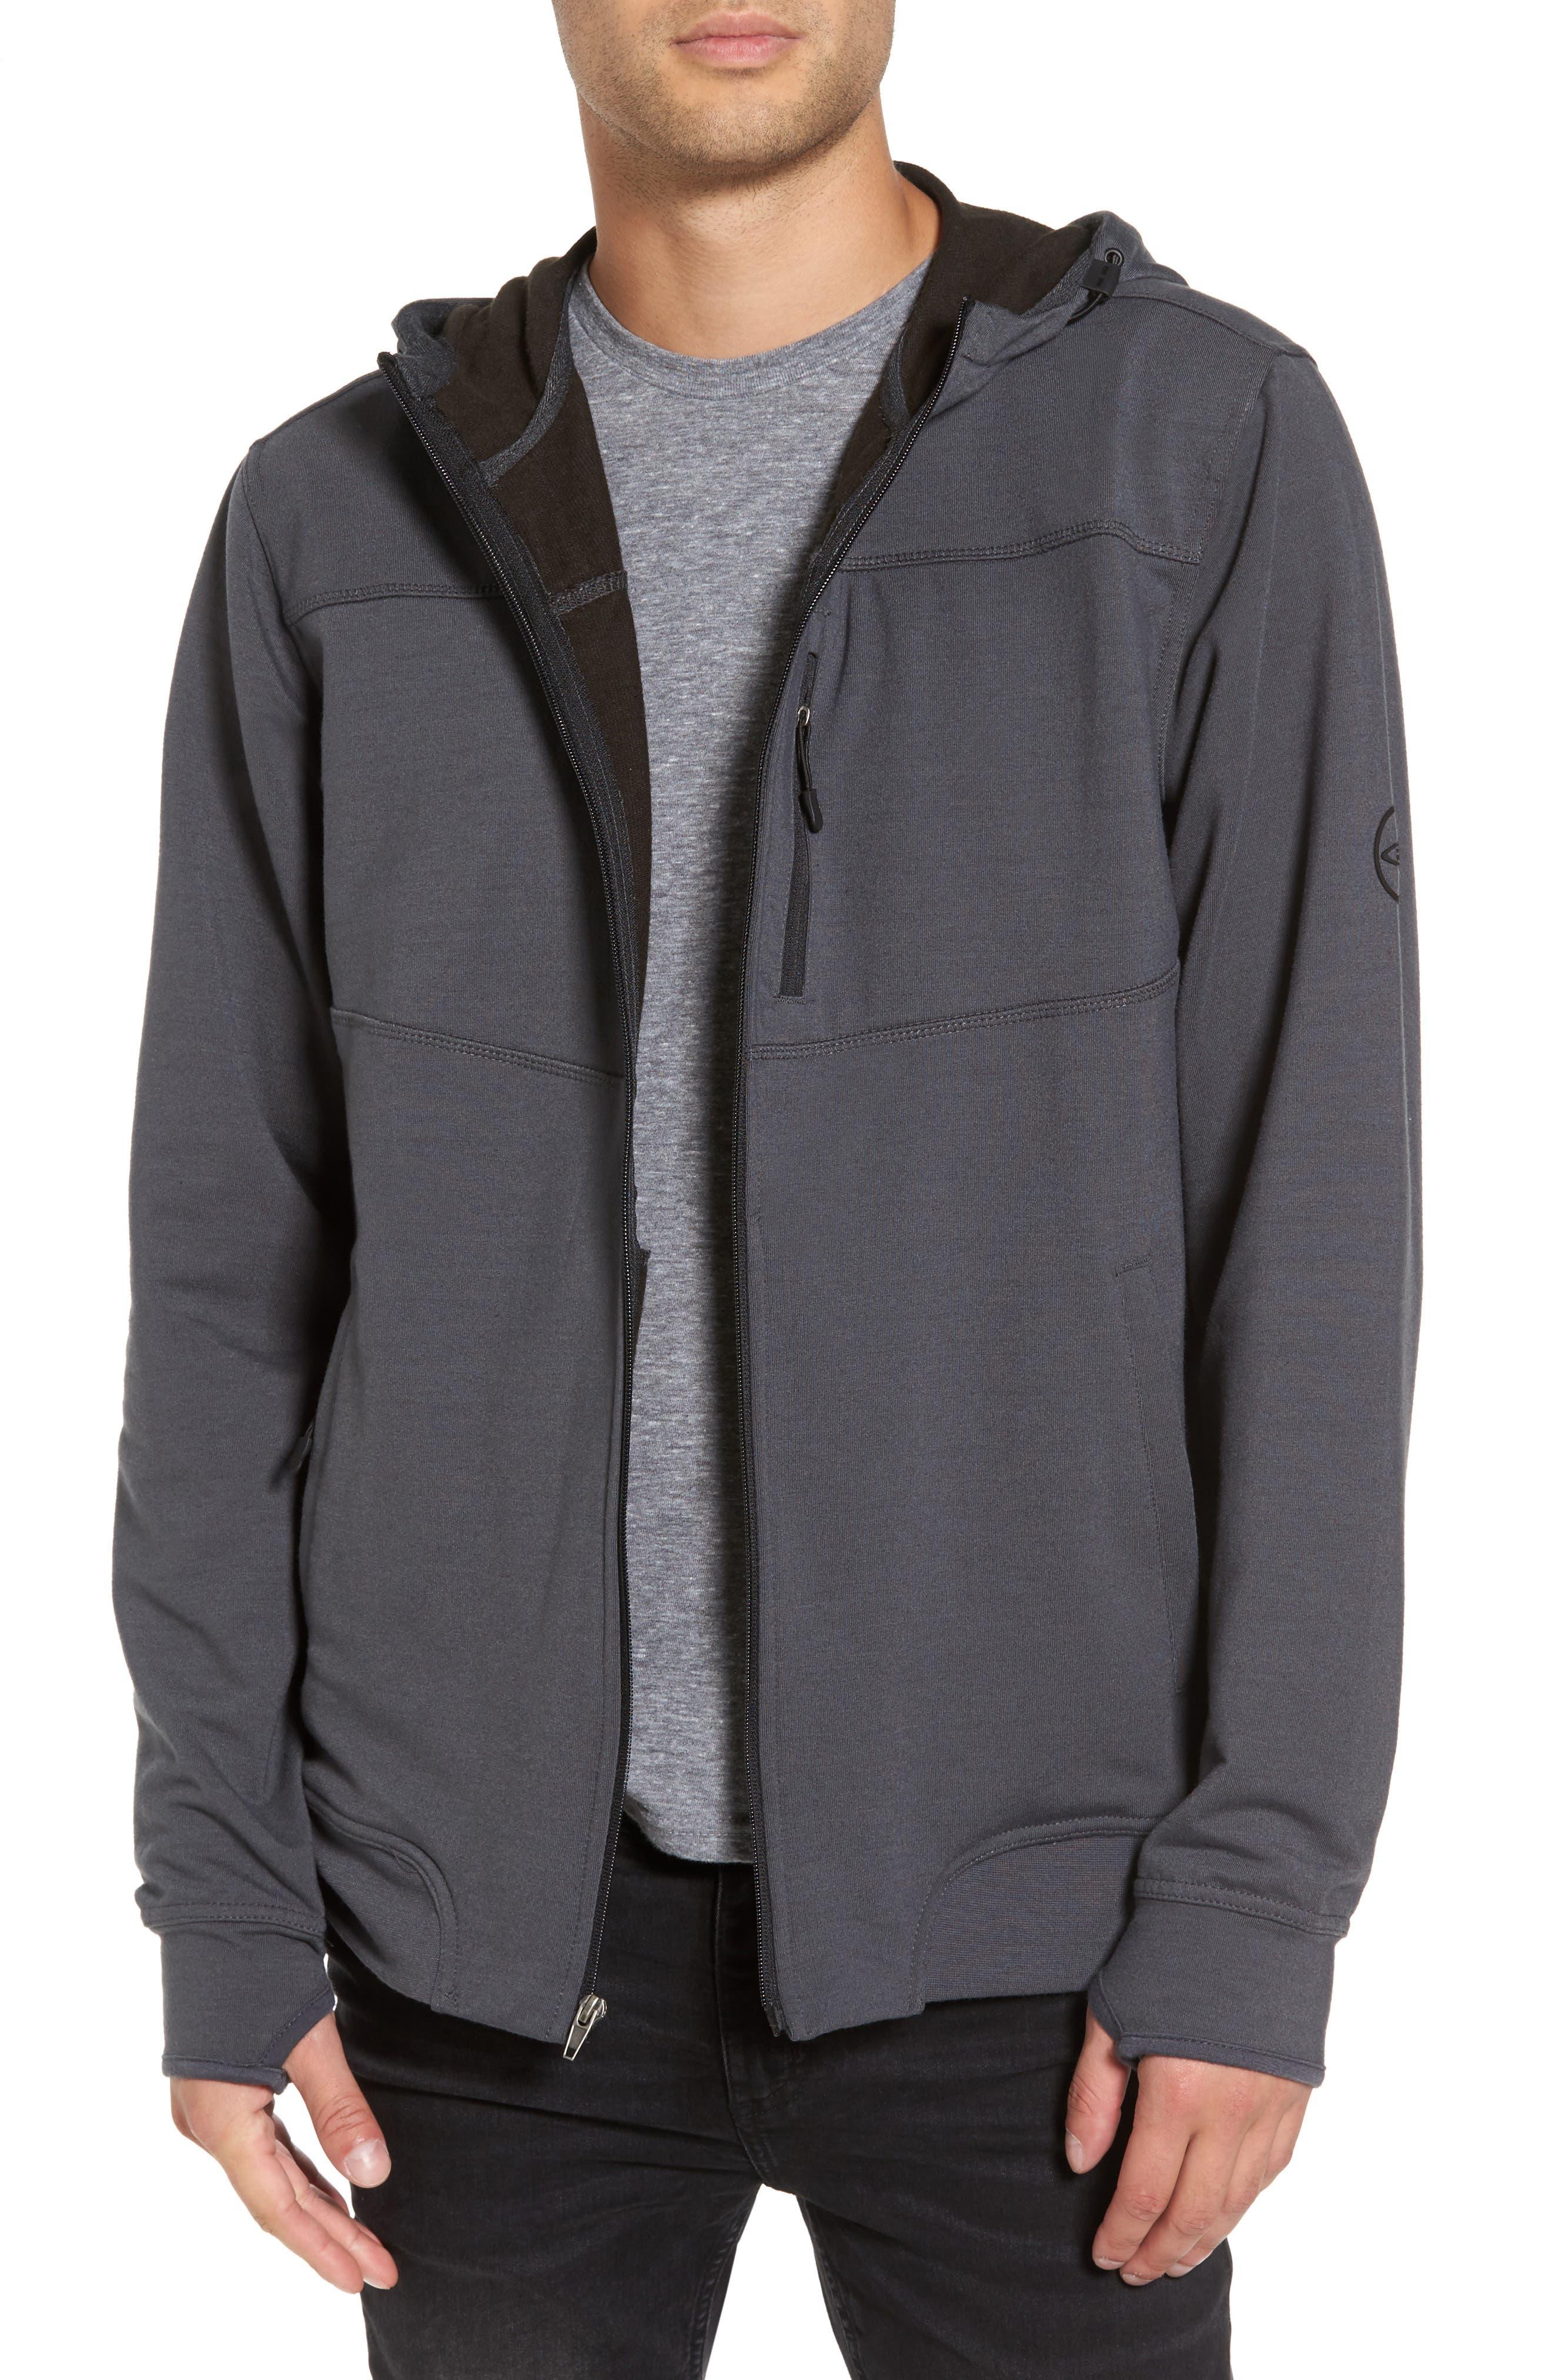 Alternate Image 1 Selected - O'Neill Traveler Hyperhoodie Jacket